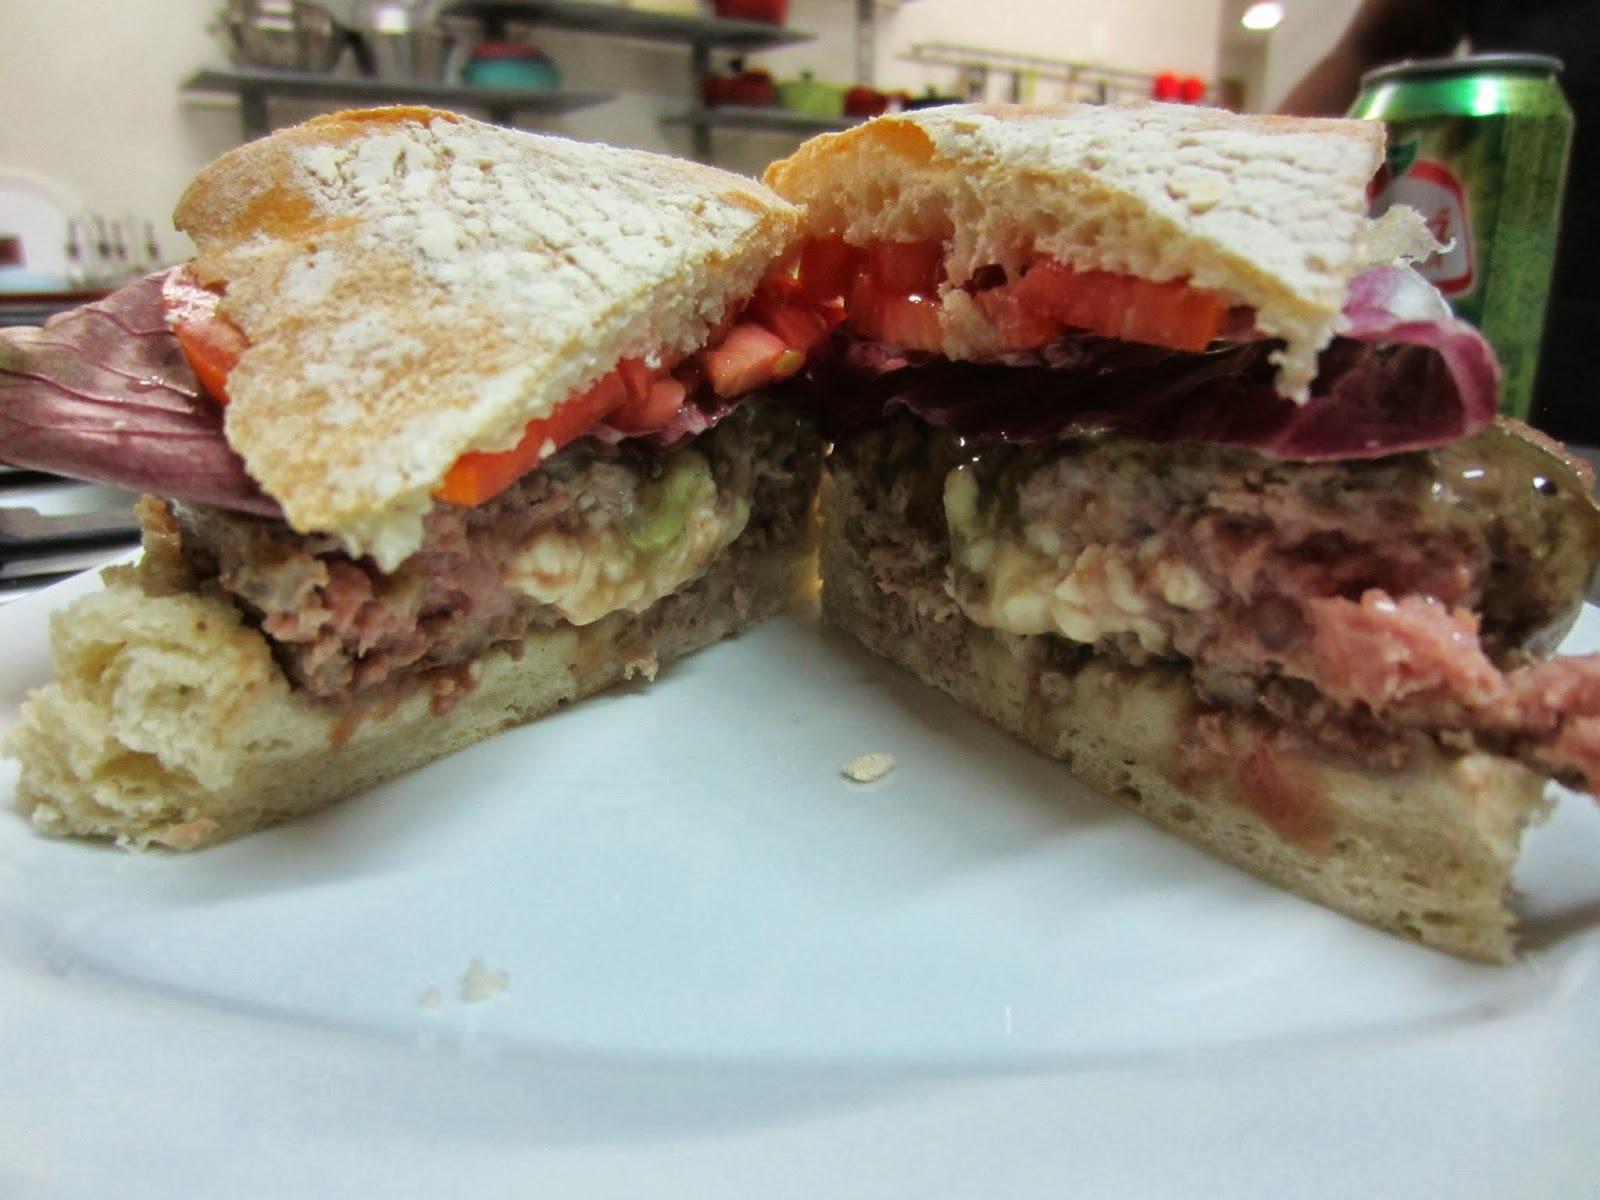 Hambúrguer de Cordeiro com queijo feta - Post IV de V